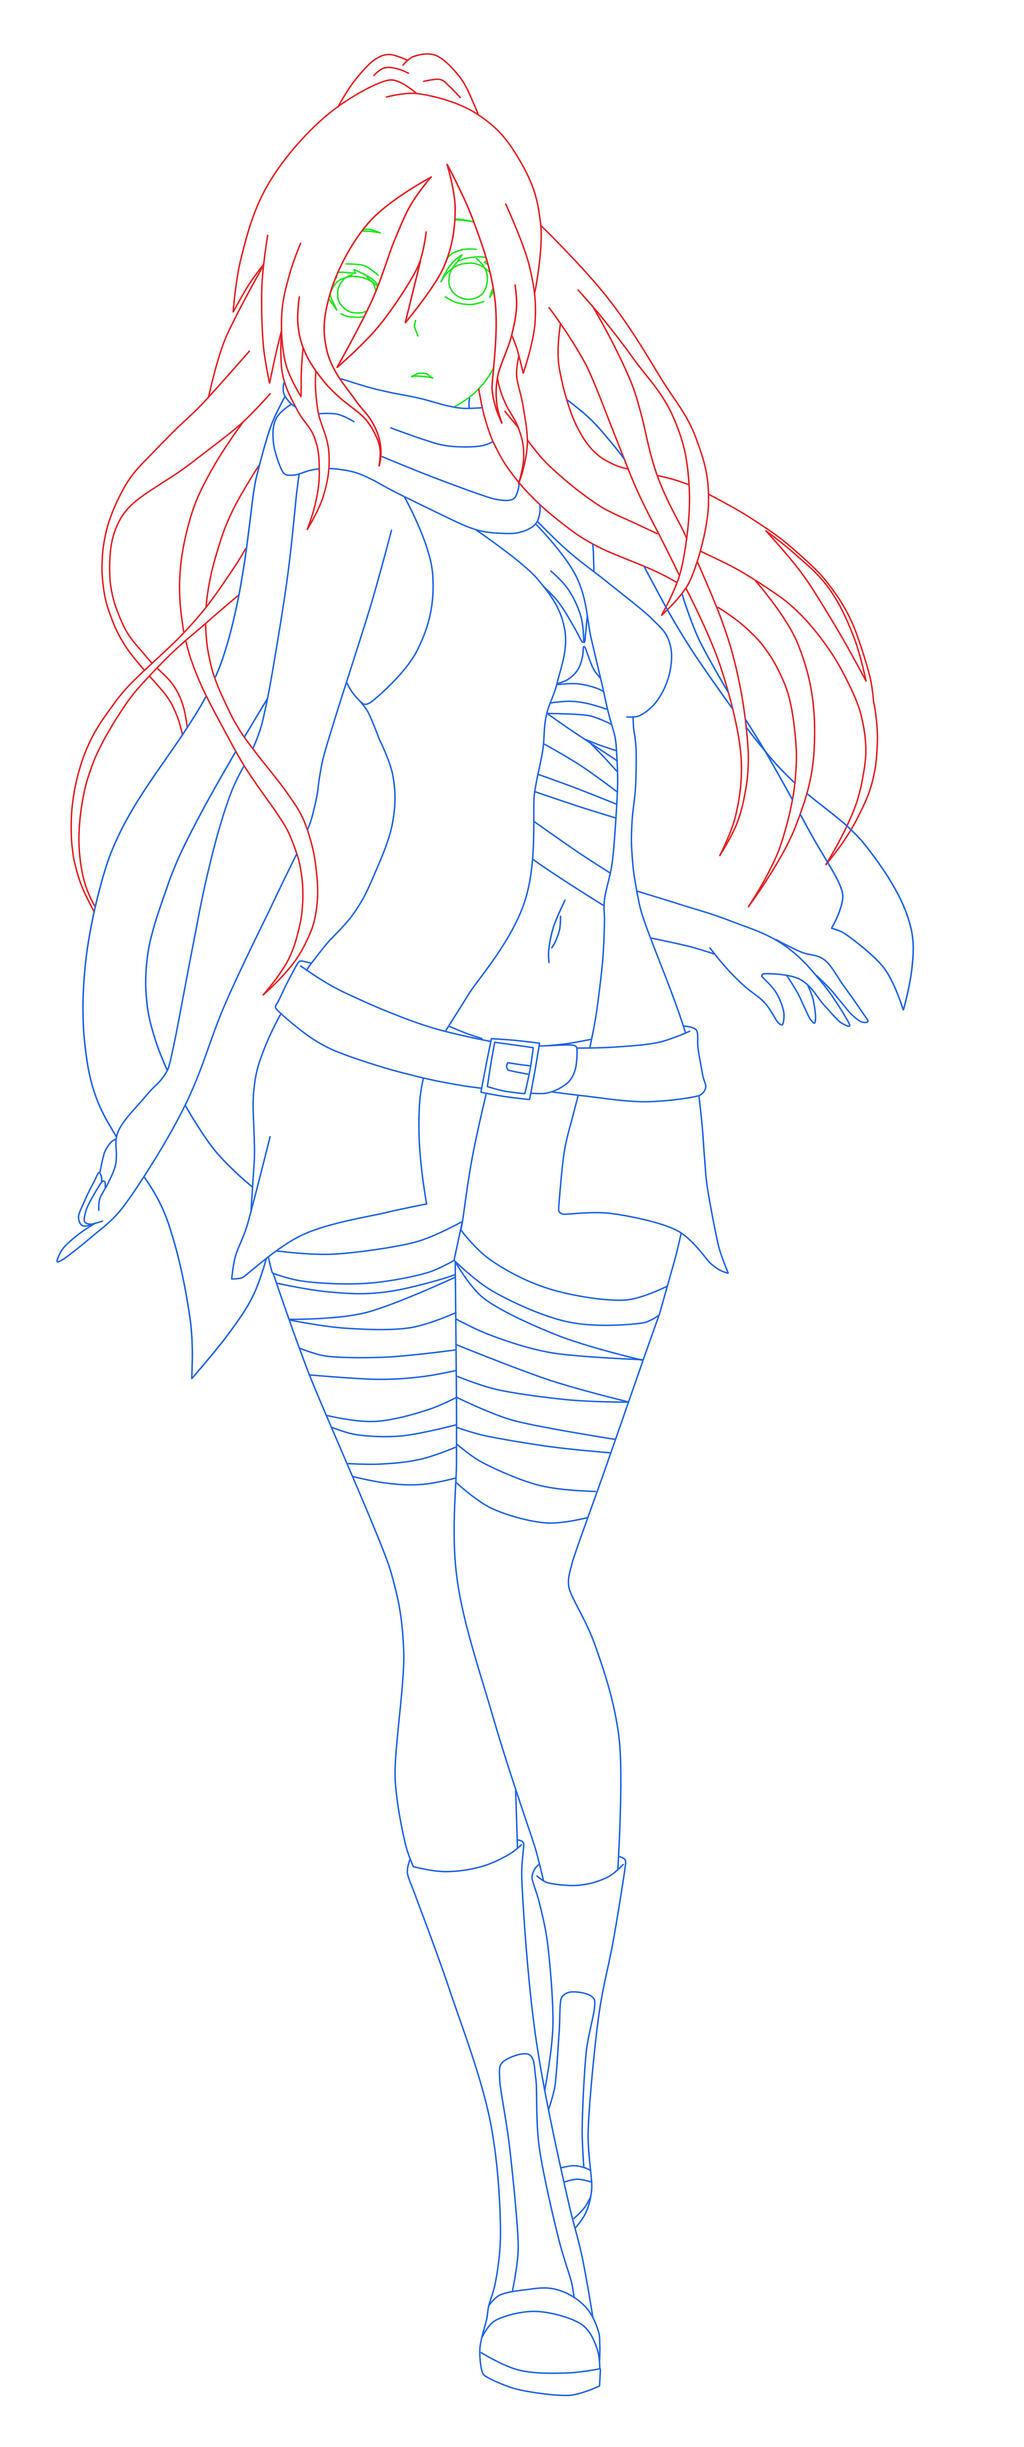 Full Body  Hatsu-chan :3 by HatsuriAndBlackNight